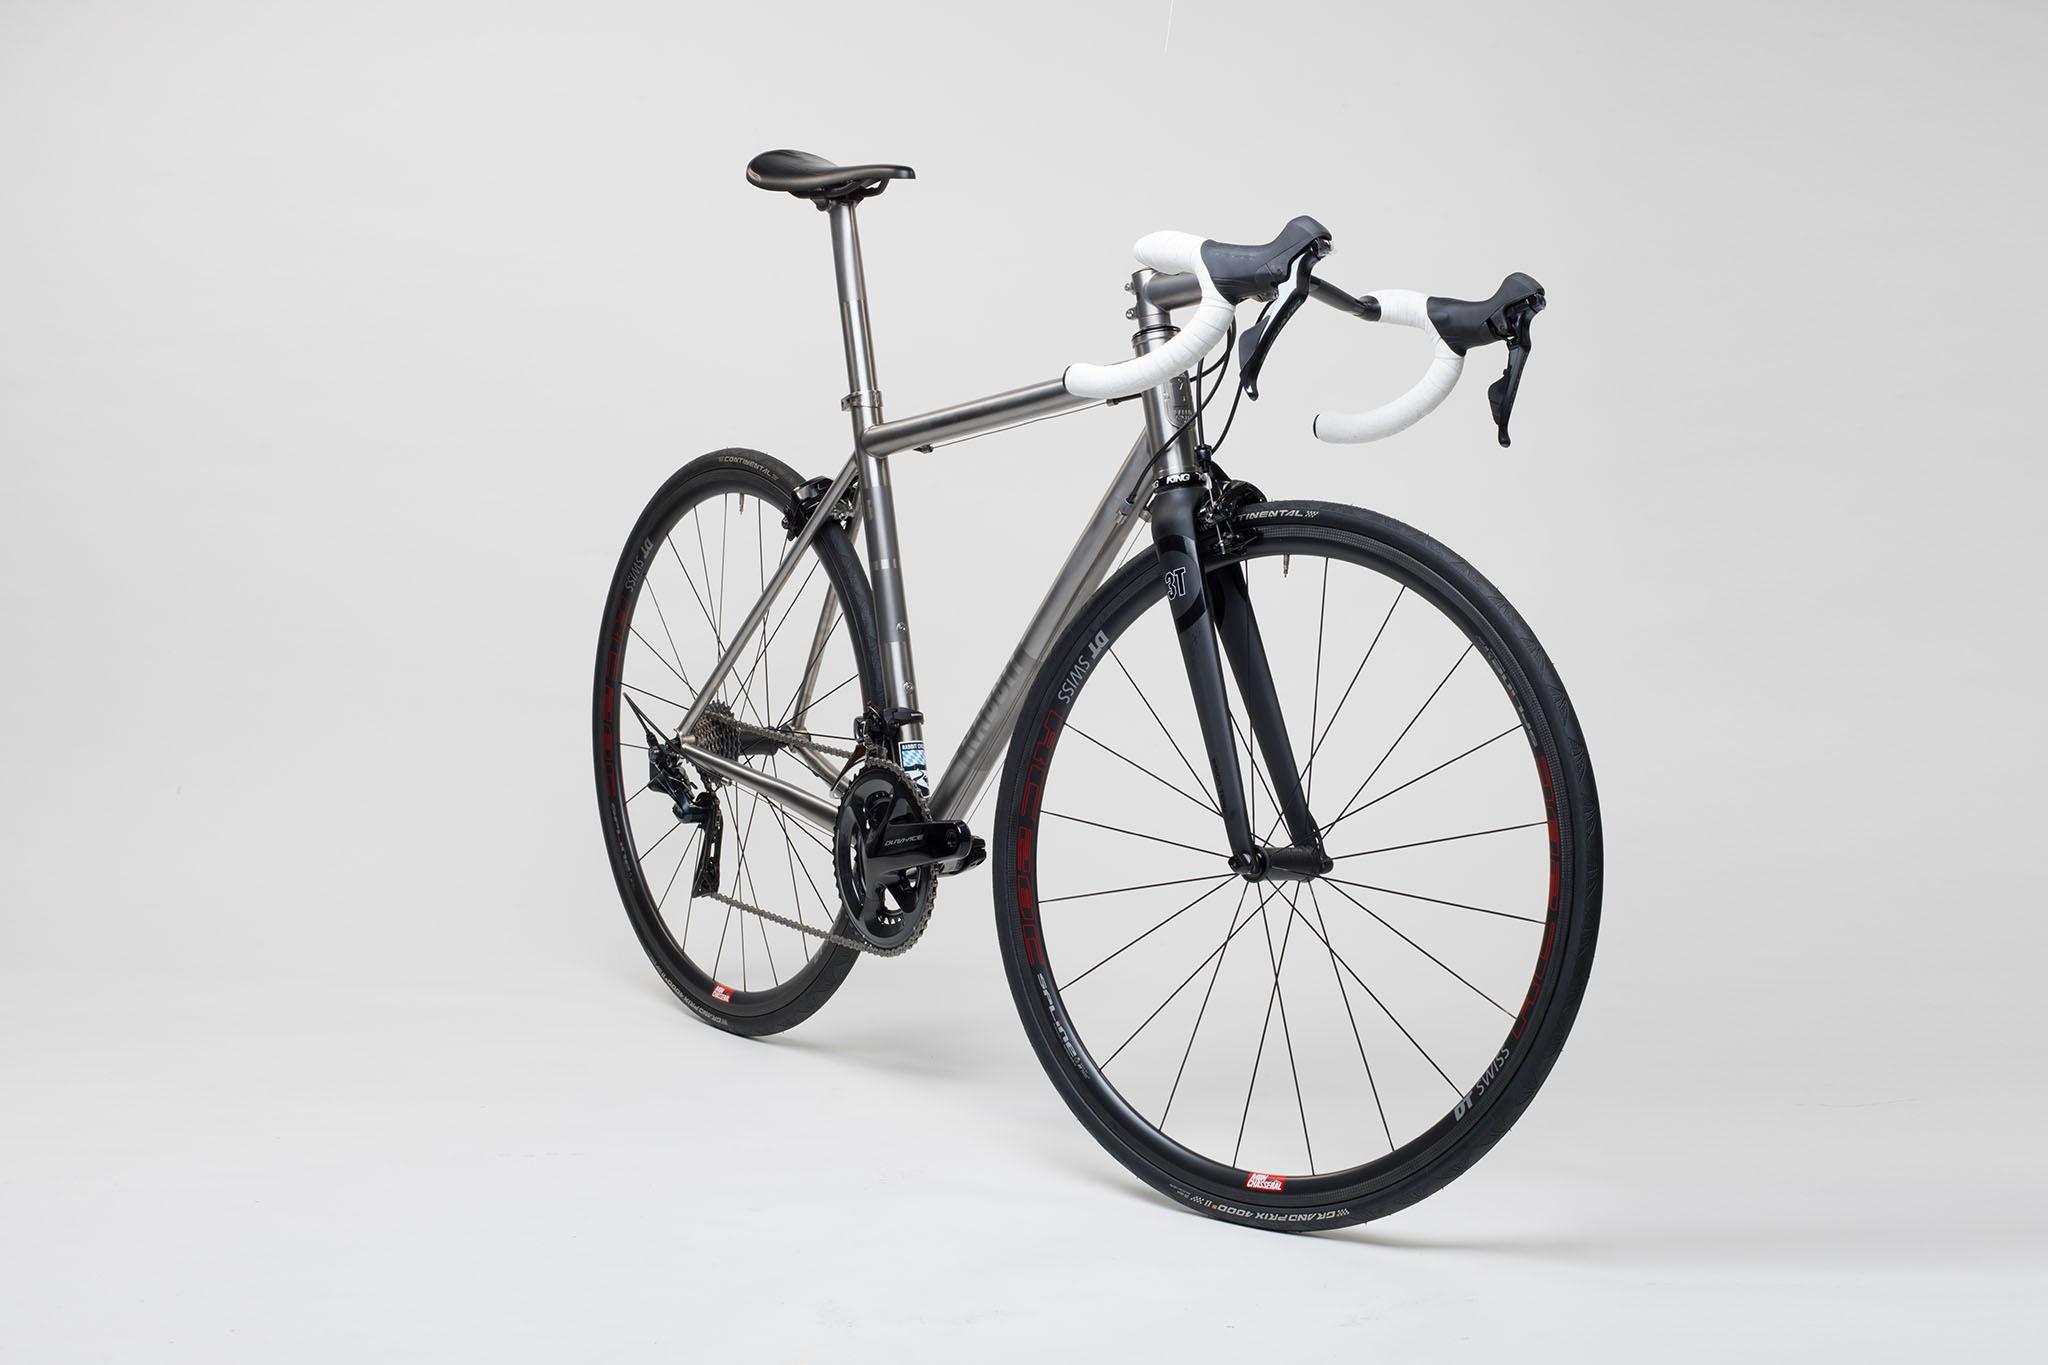 titan_road_classic_bike_02_from_rabbit_titan_cycles_bavaria